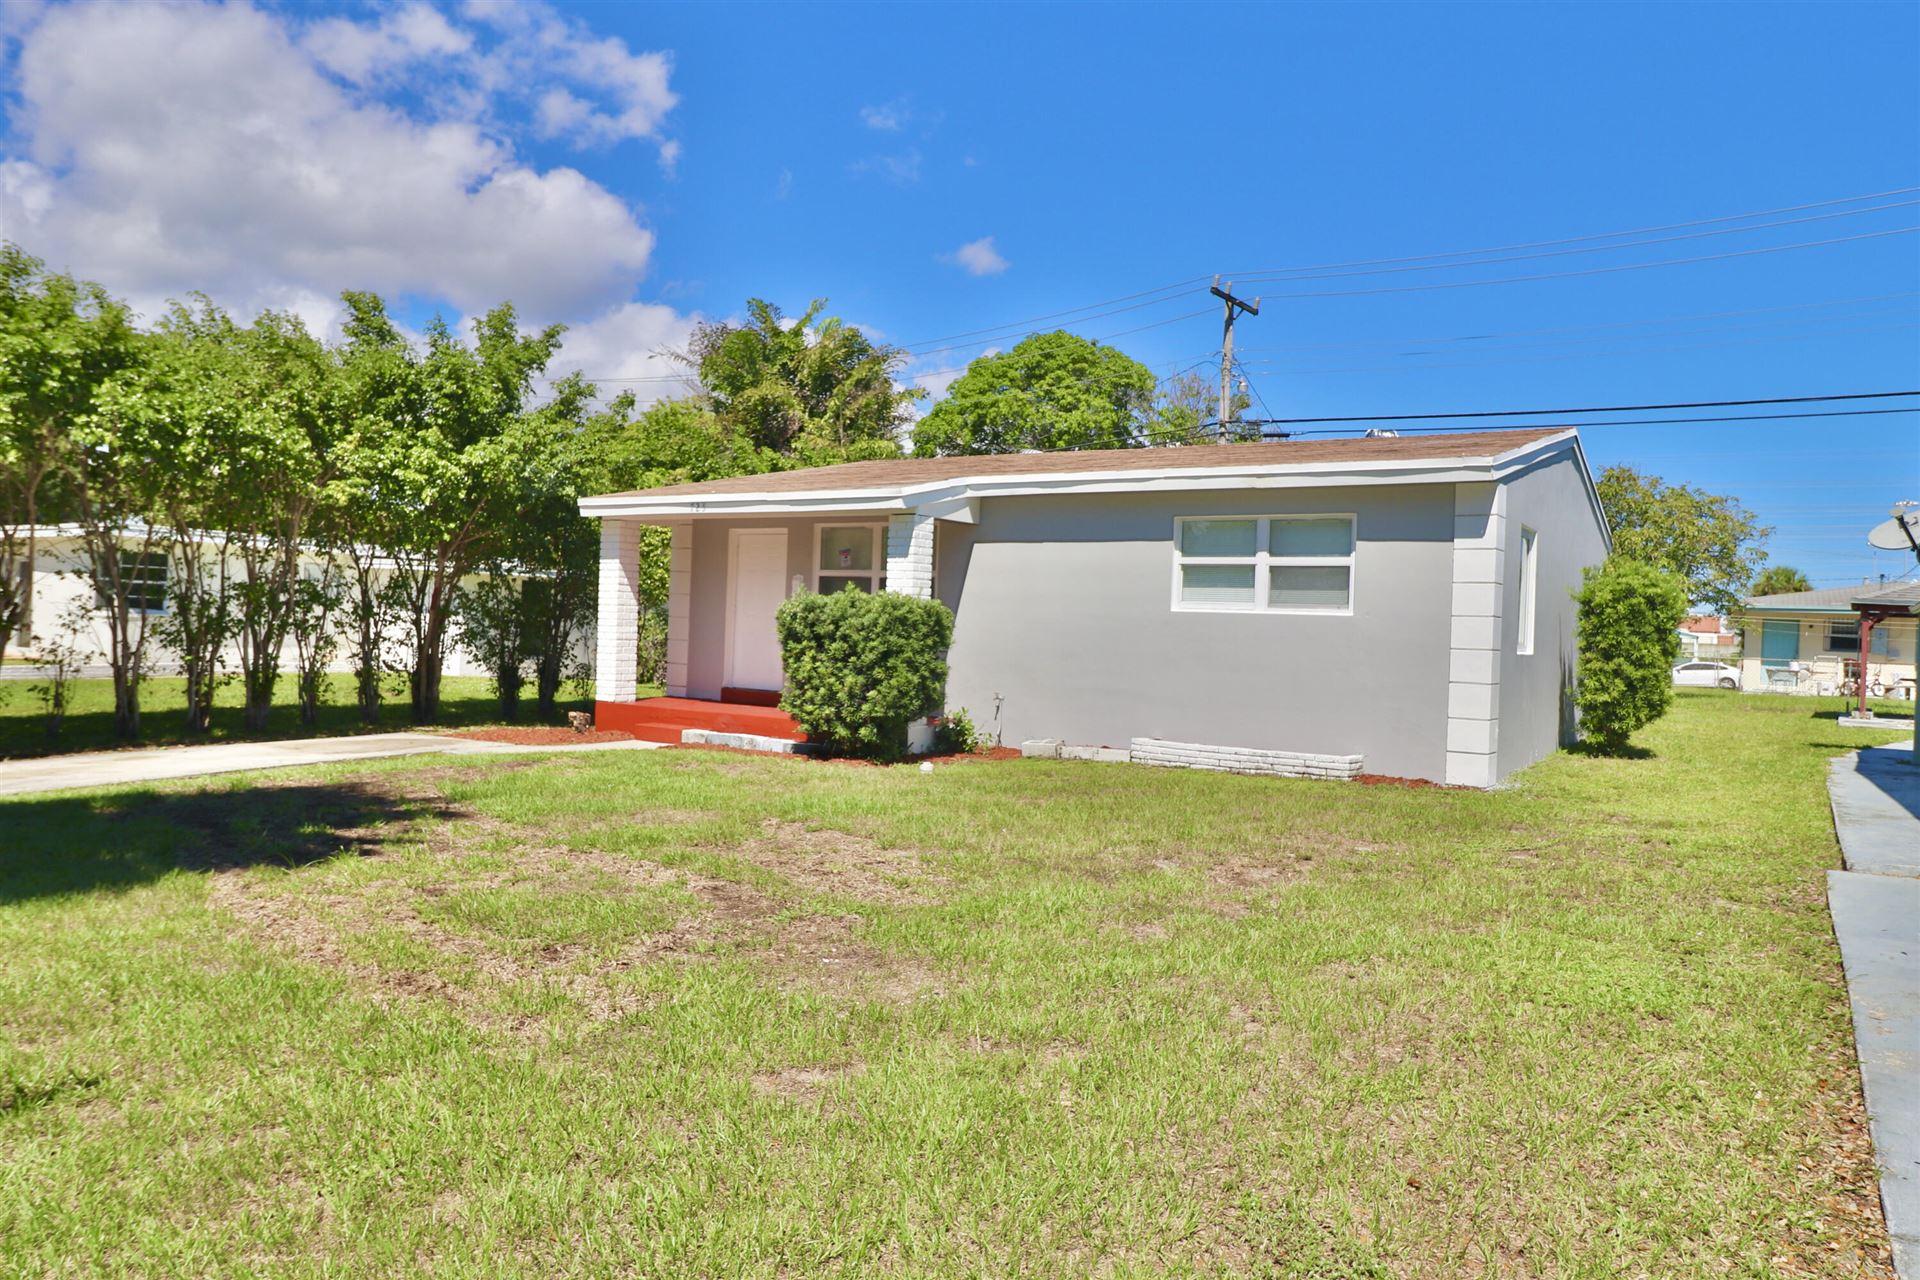 725 58th Street, West Palm Beach, FL 33407 - #: RX-10749887